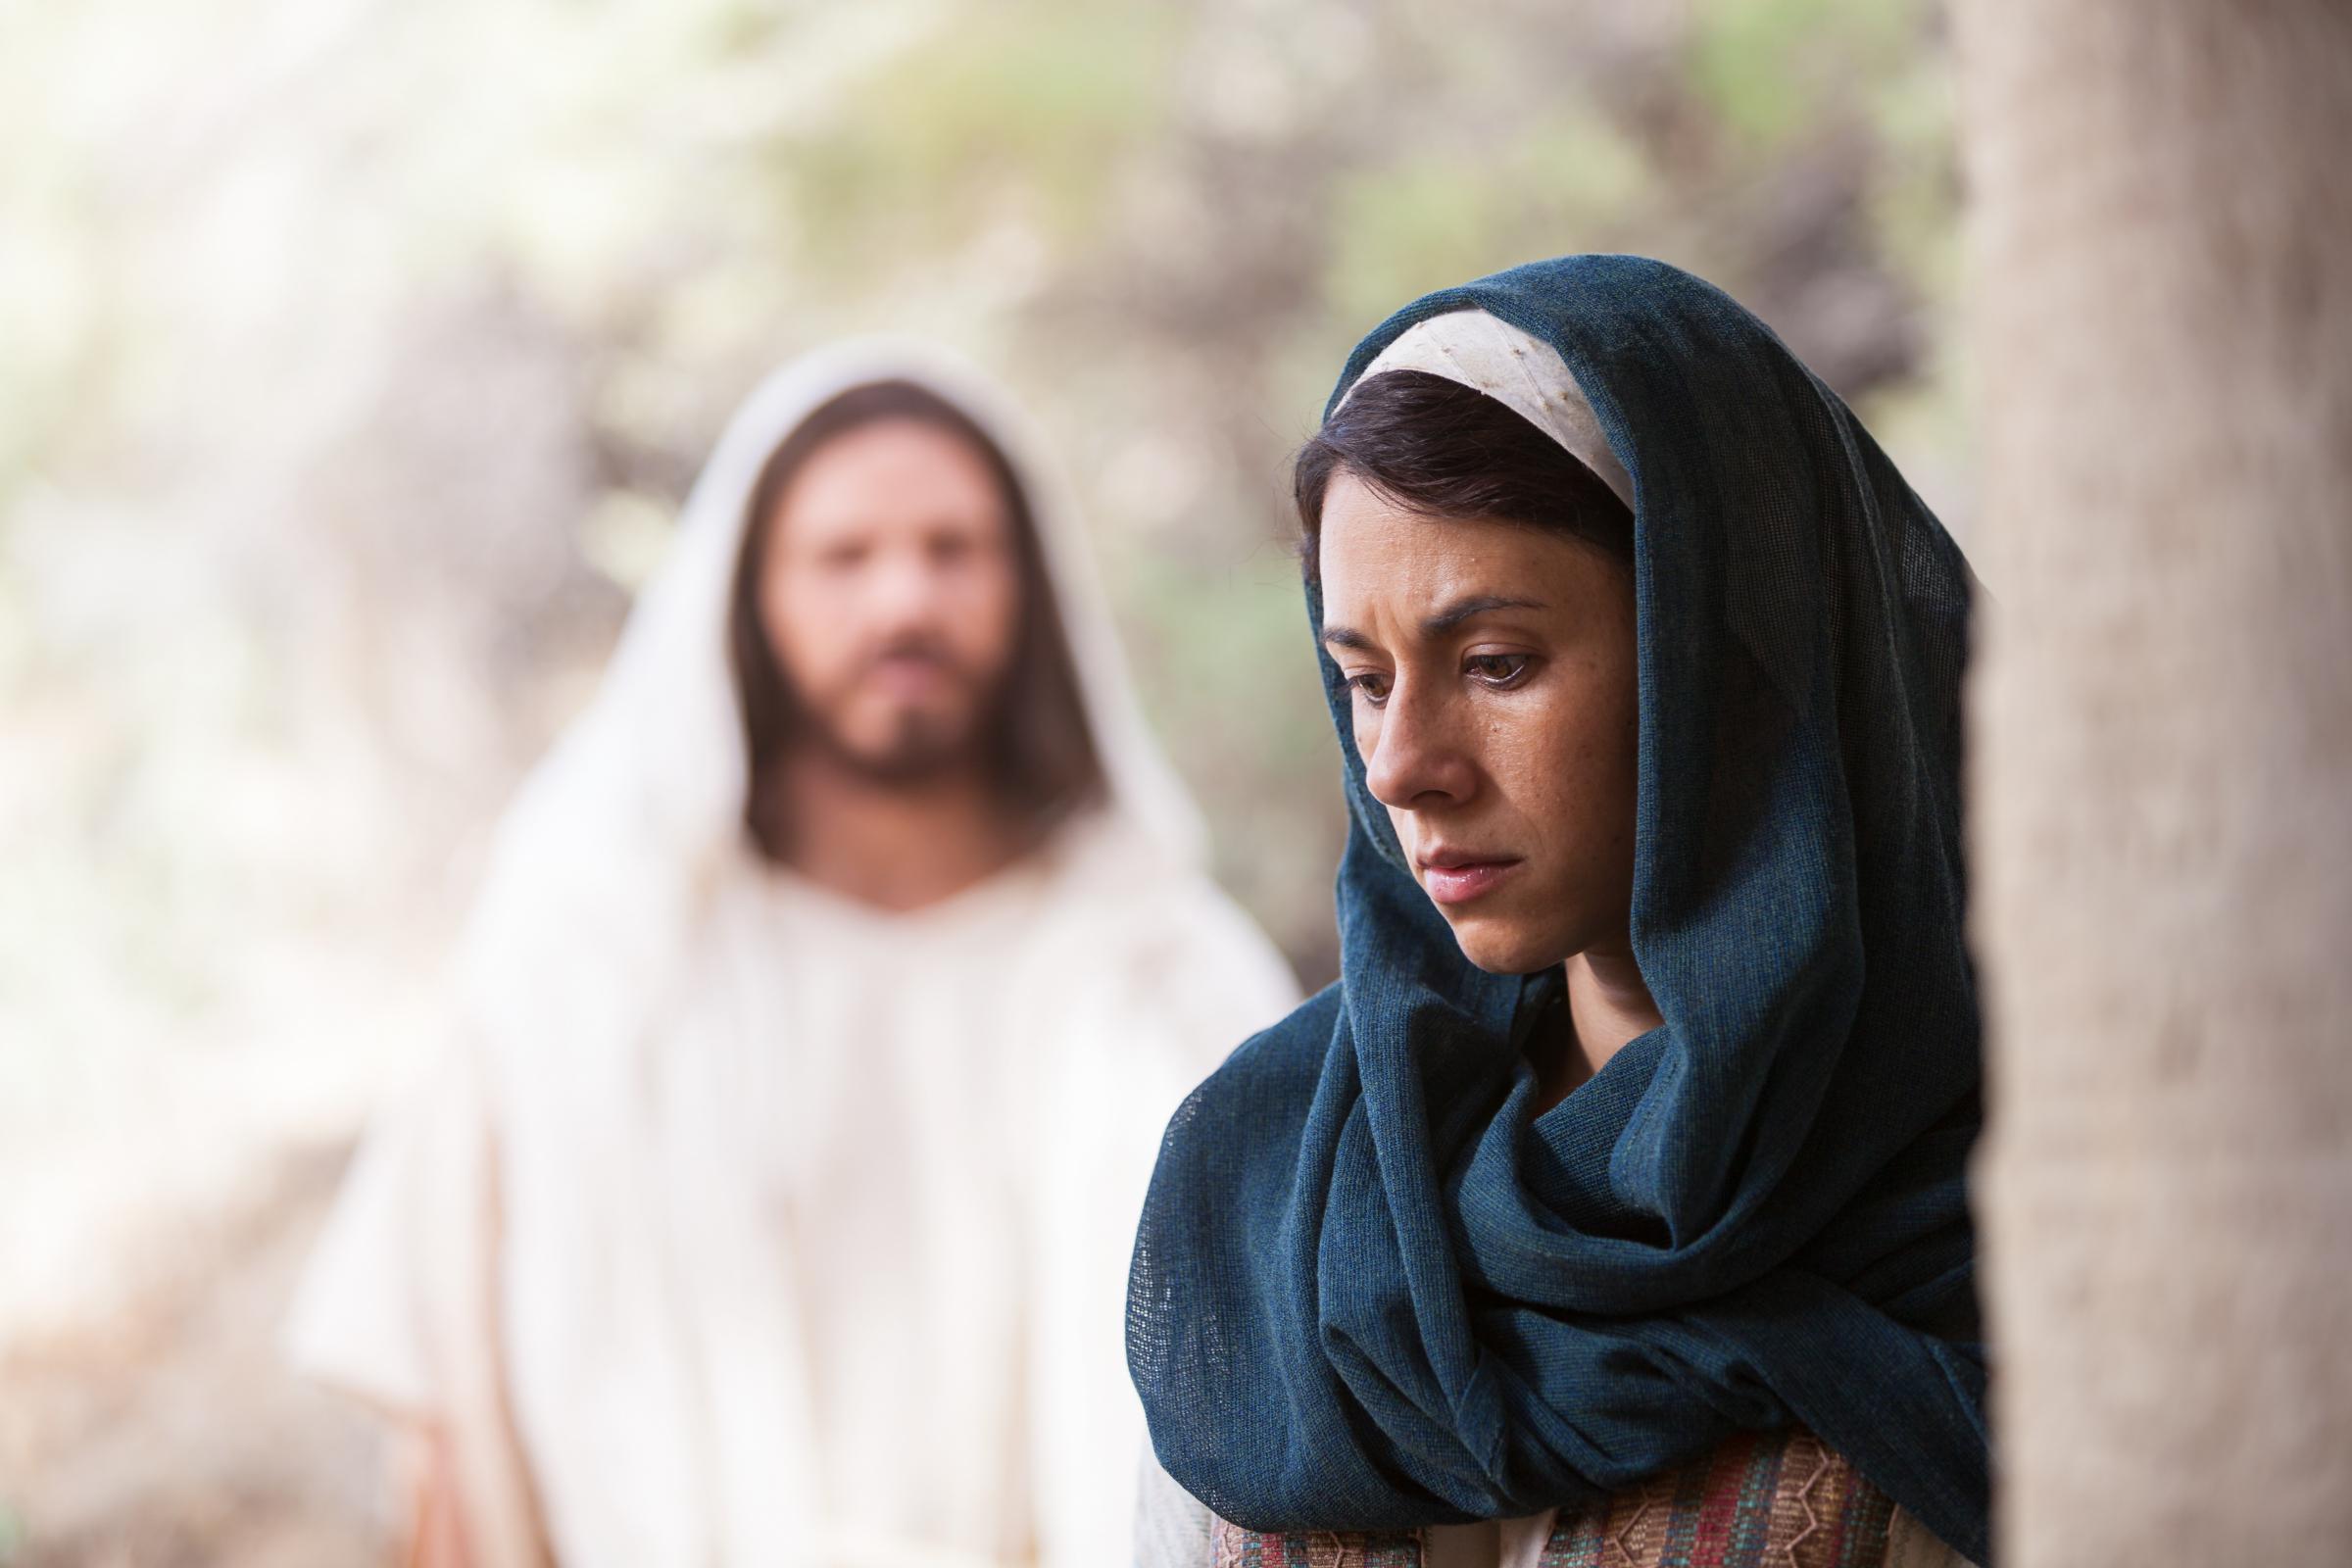 martha and mary meet jesus face